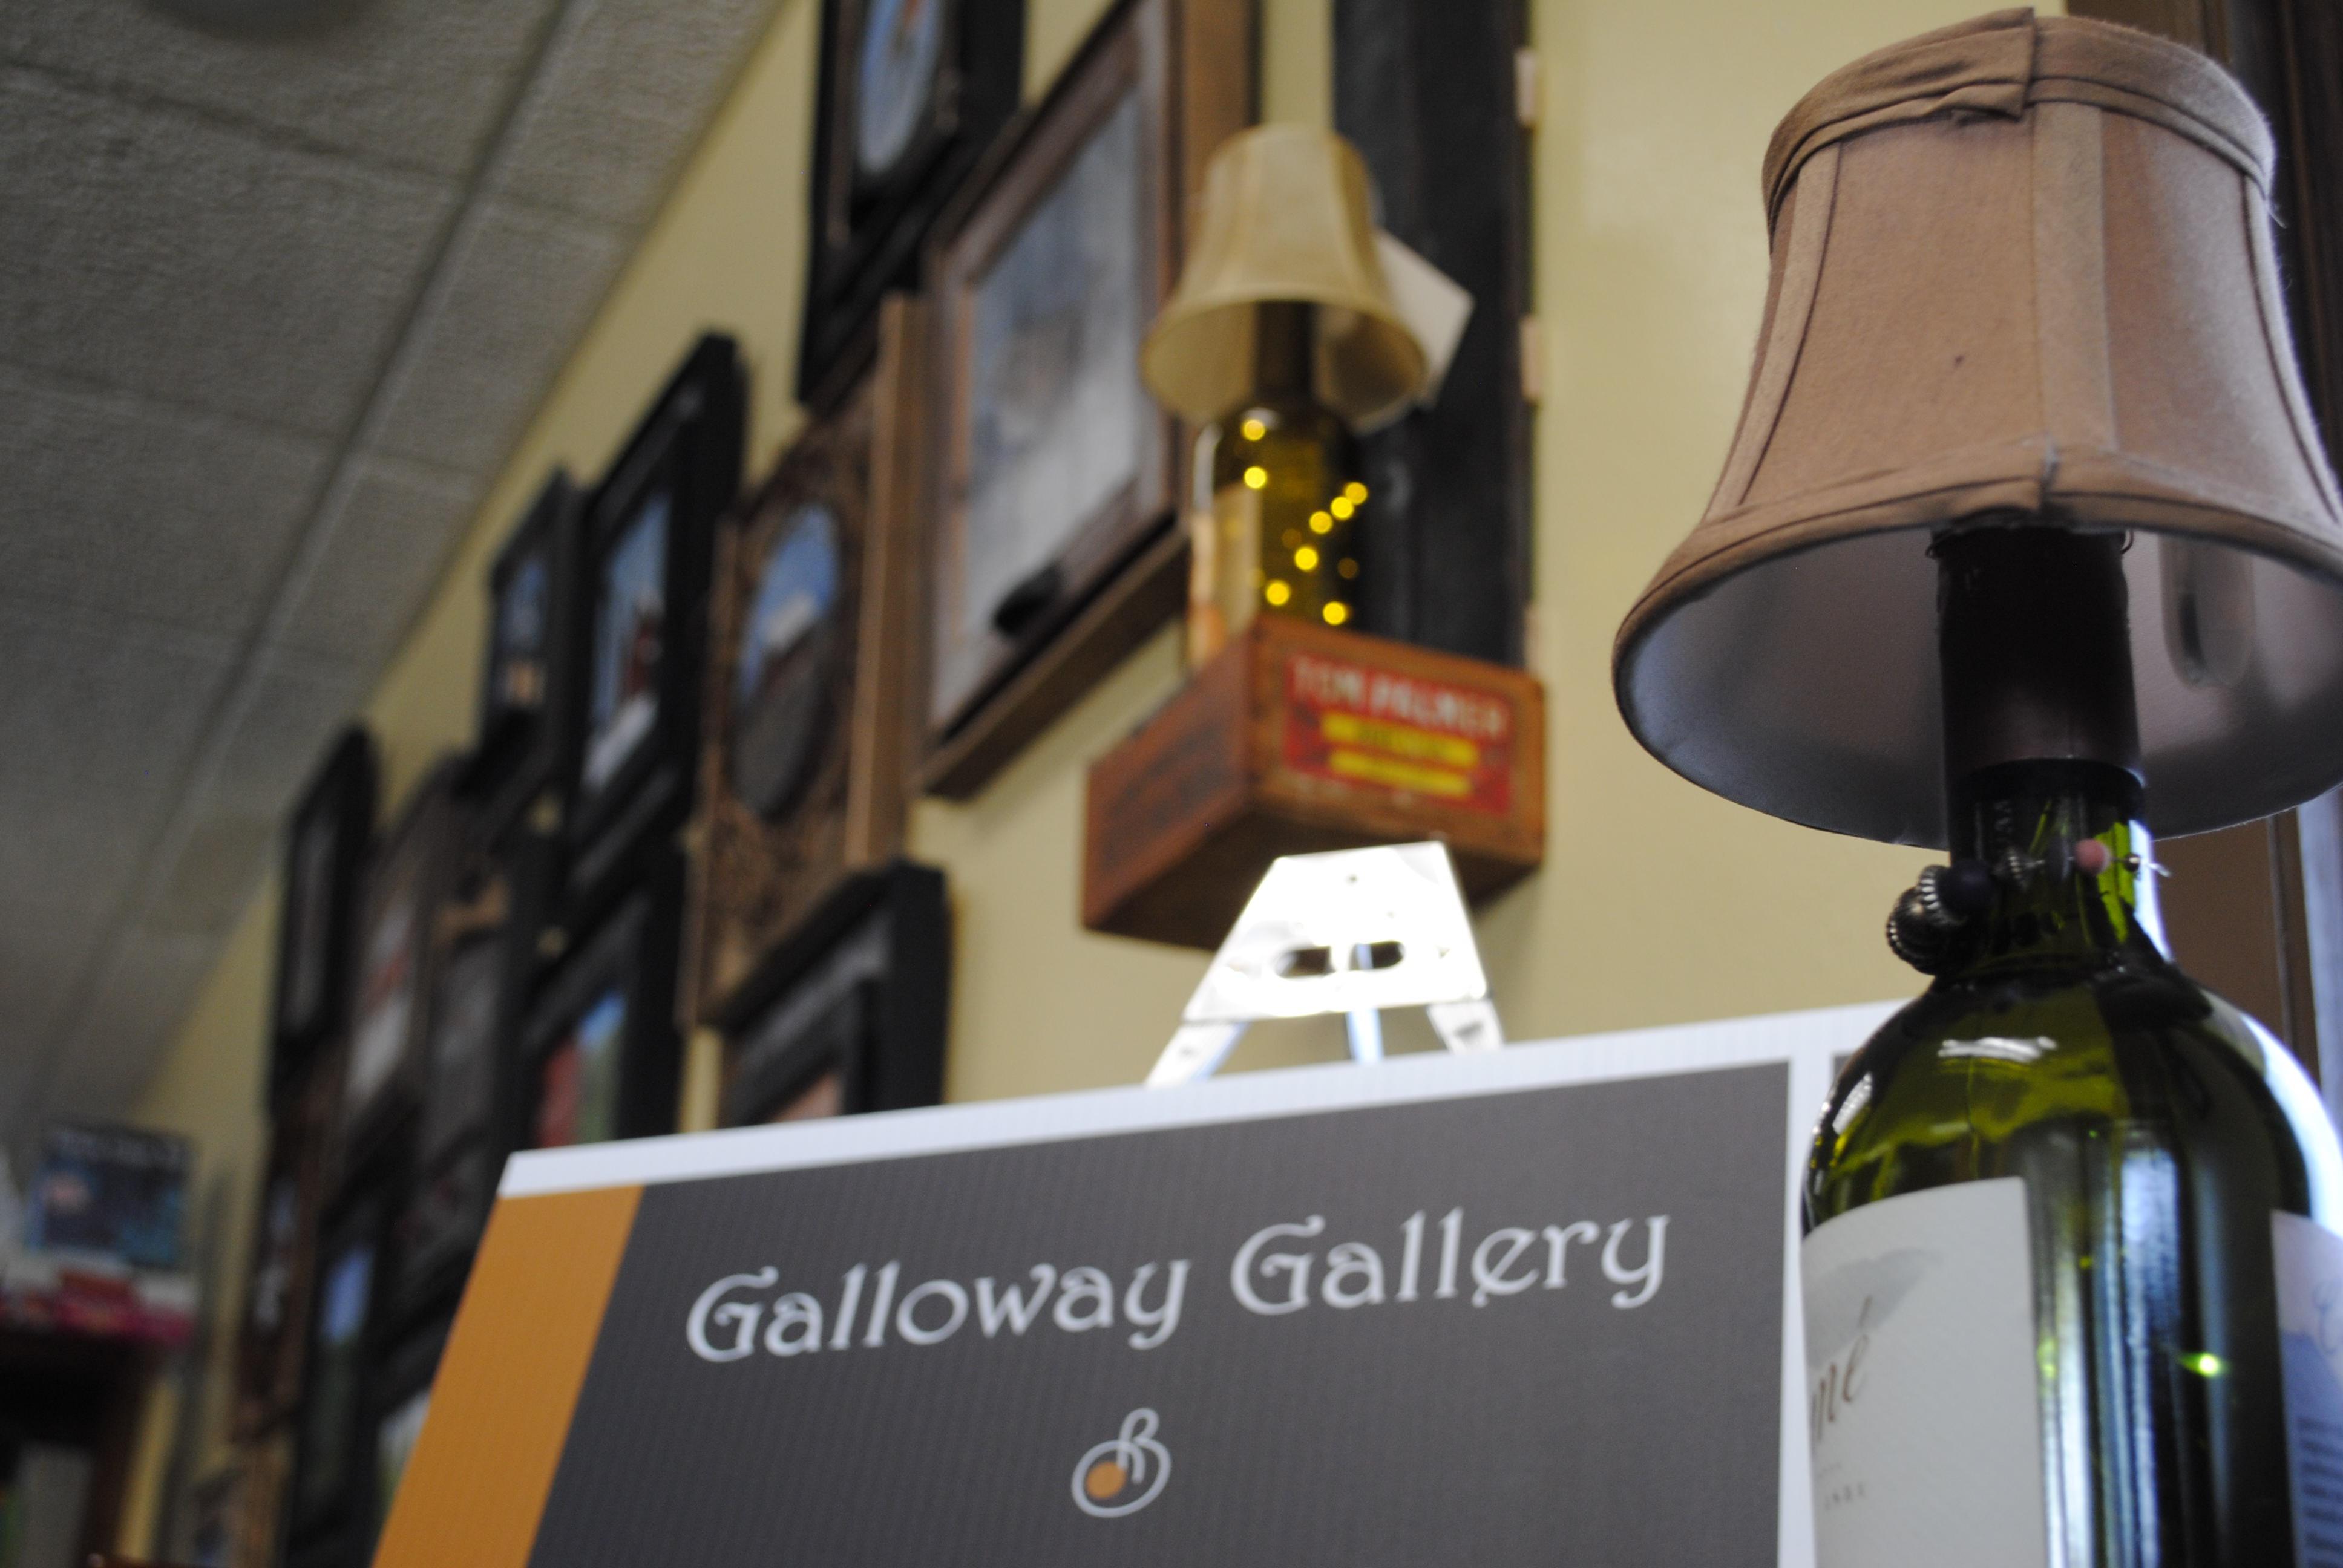 Galloway Gallery